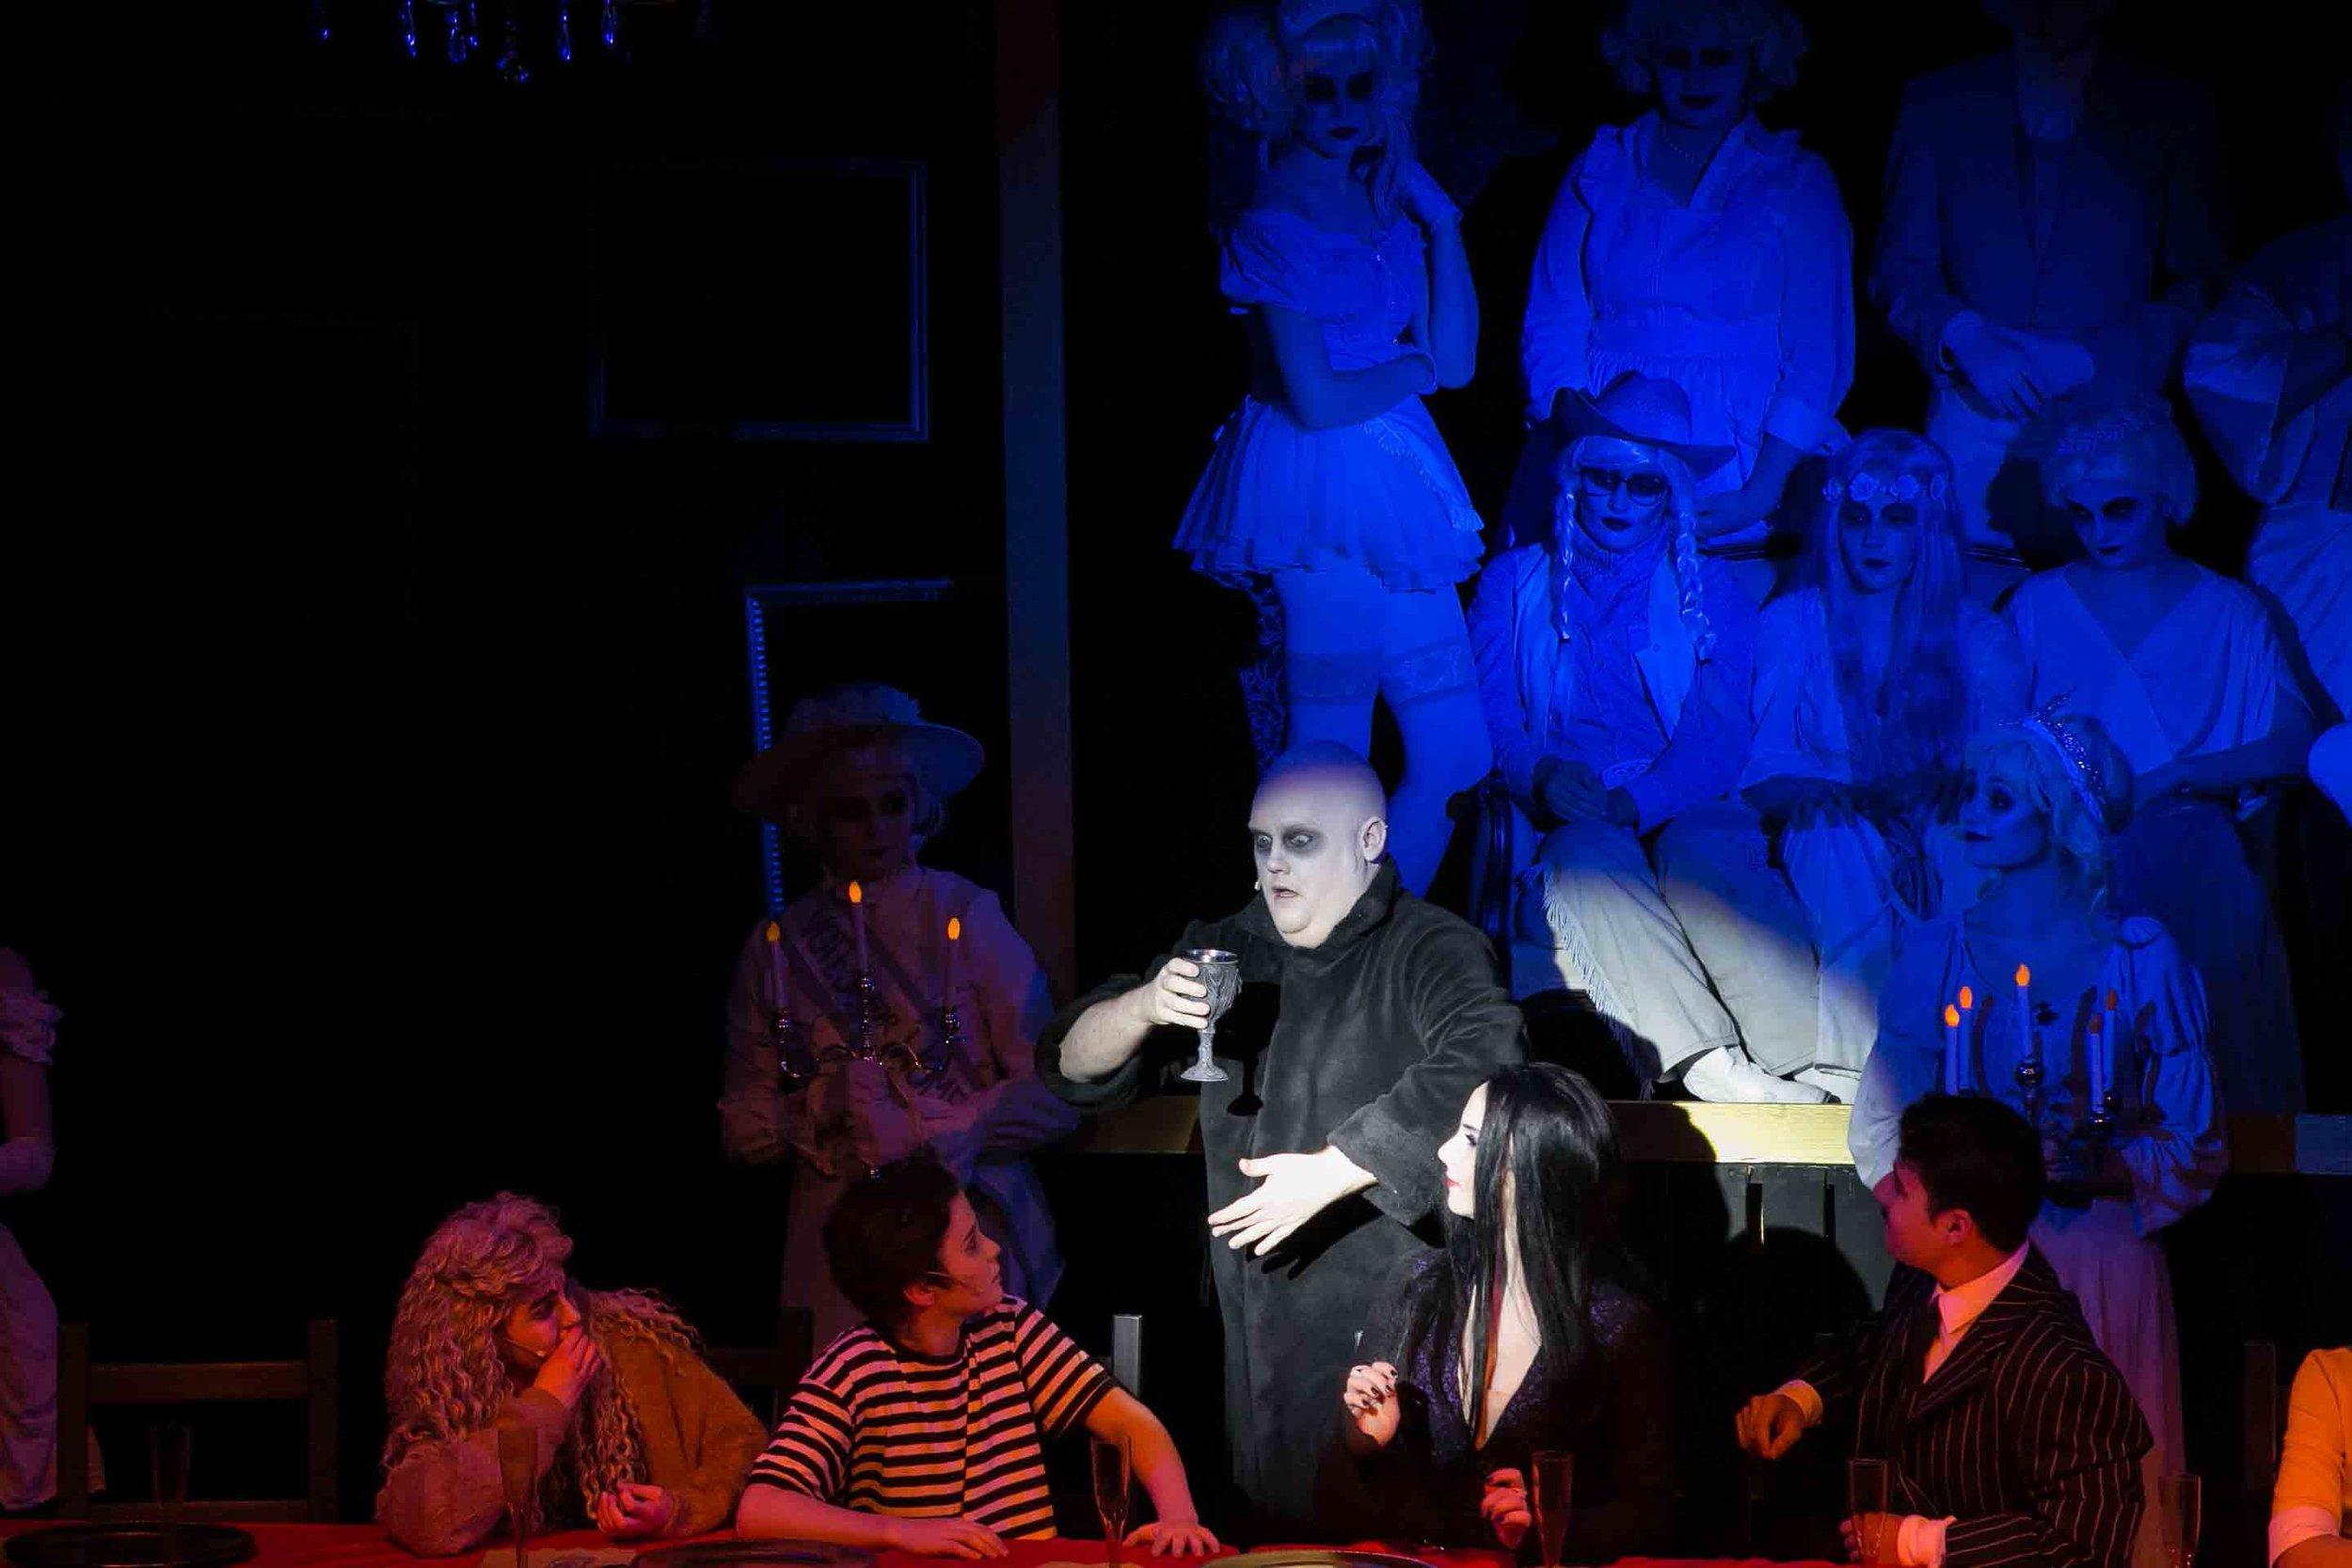 6-19-16 Addams Family Creepy Cast 0187.jpg